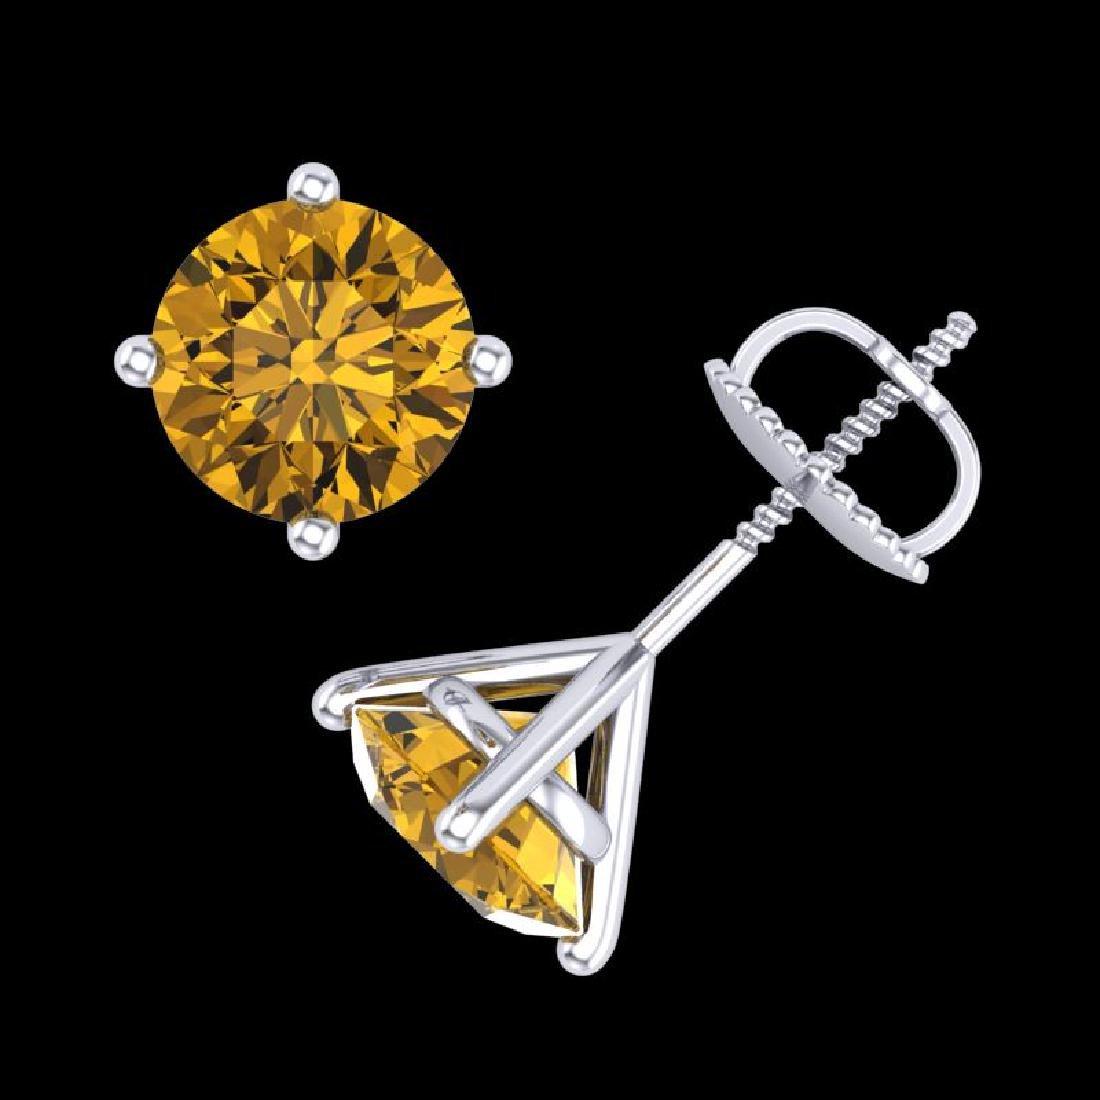 2.5 CTW Intense Fancy Yellow Diamond Art Deco Stud - 3